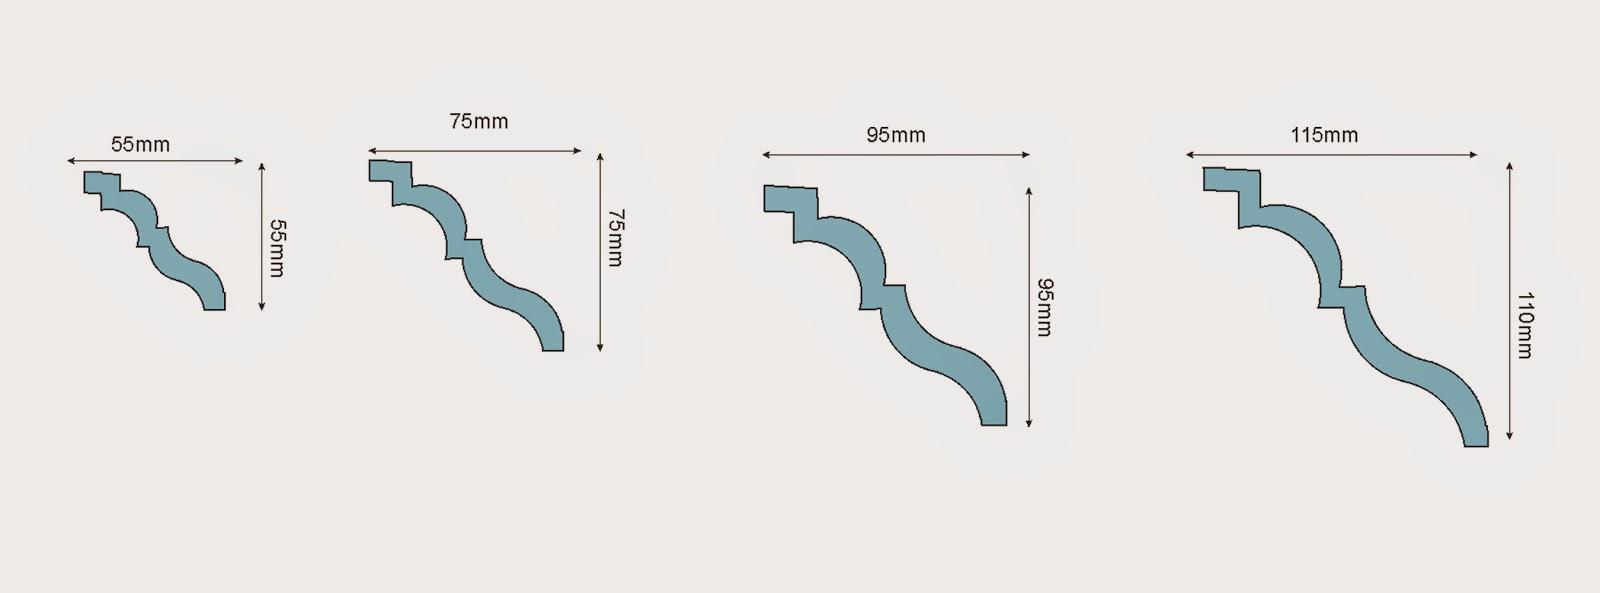 dimensiuni baghete polistiren pentru tavan la interior casa